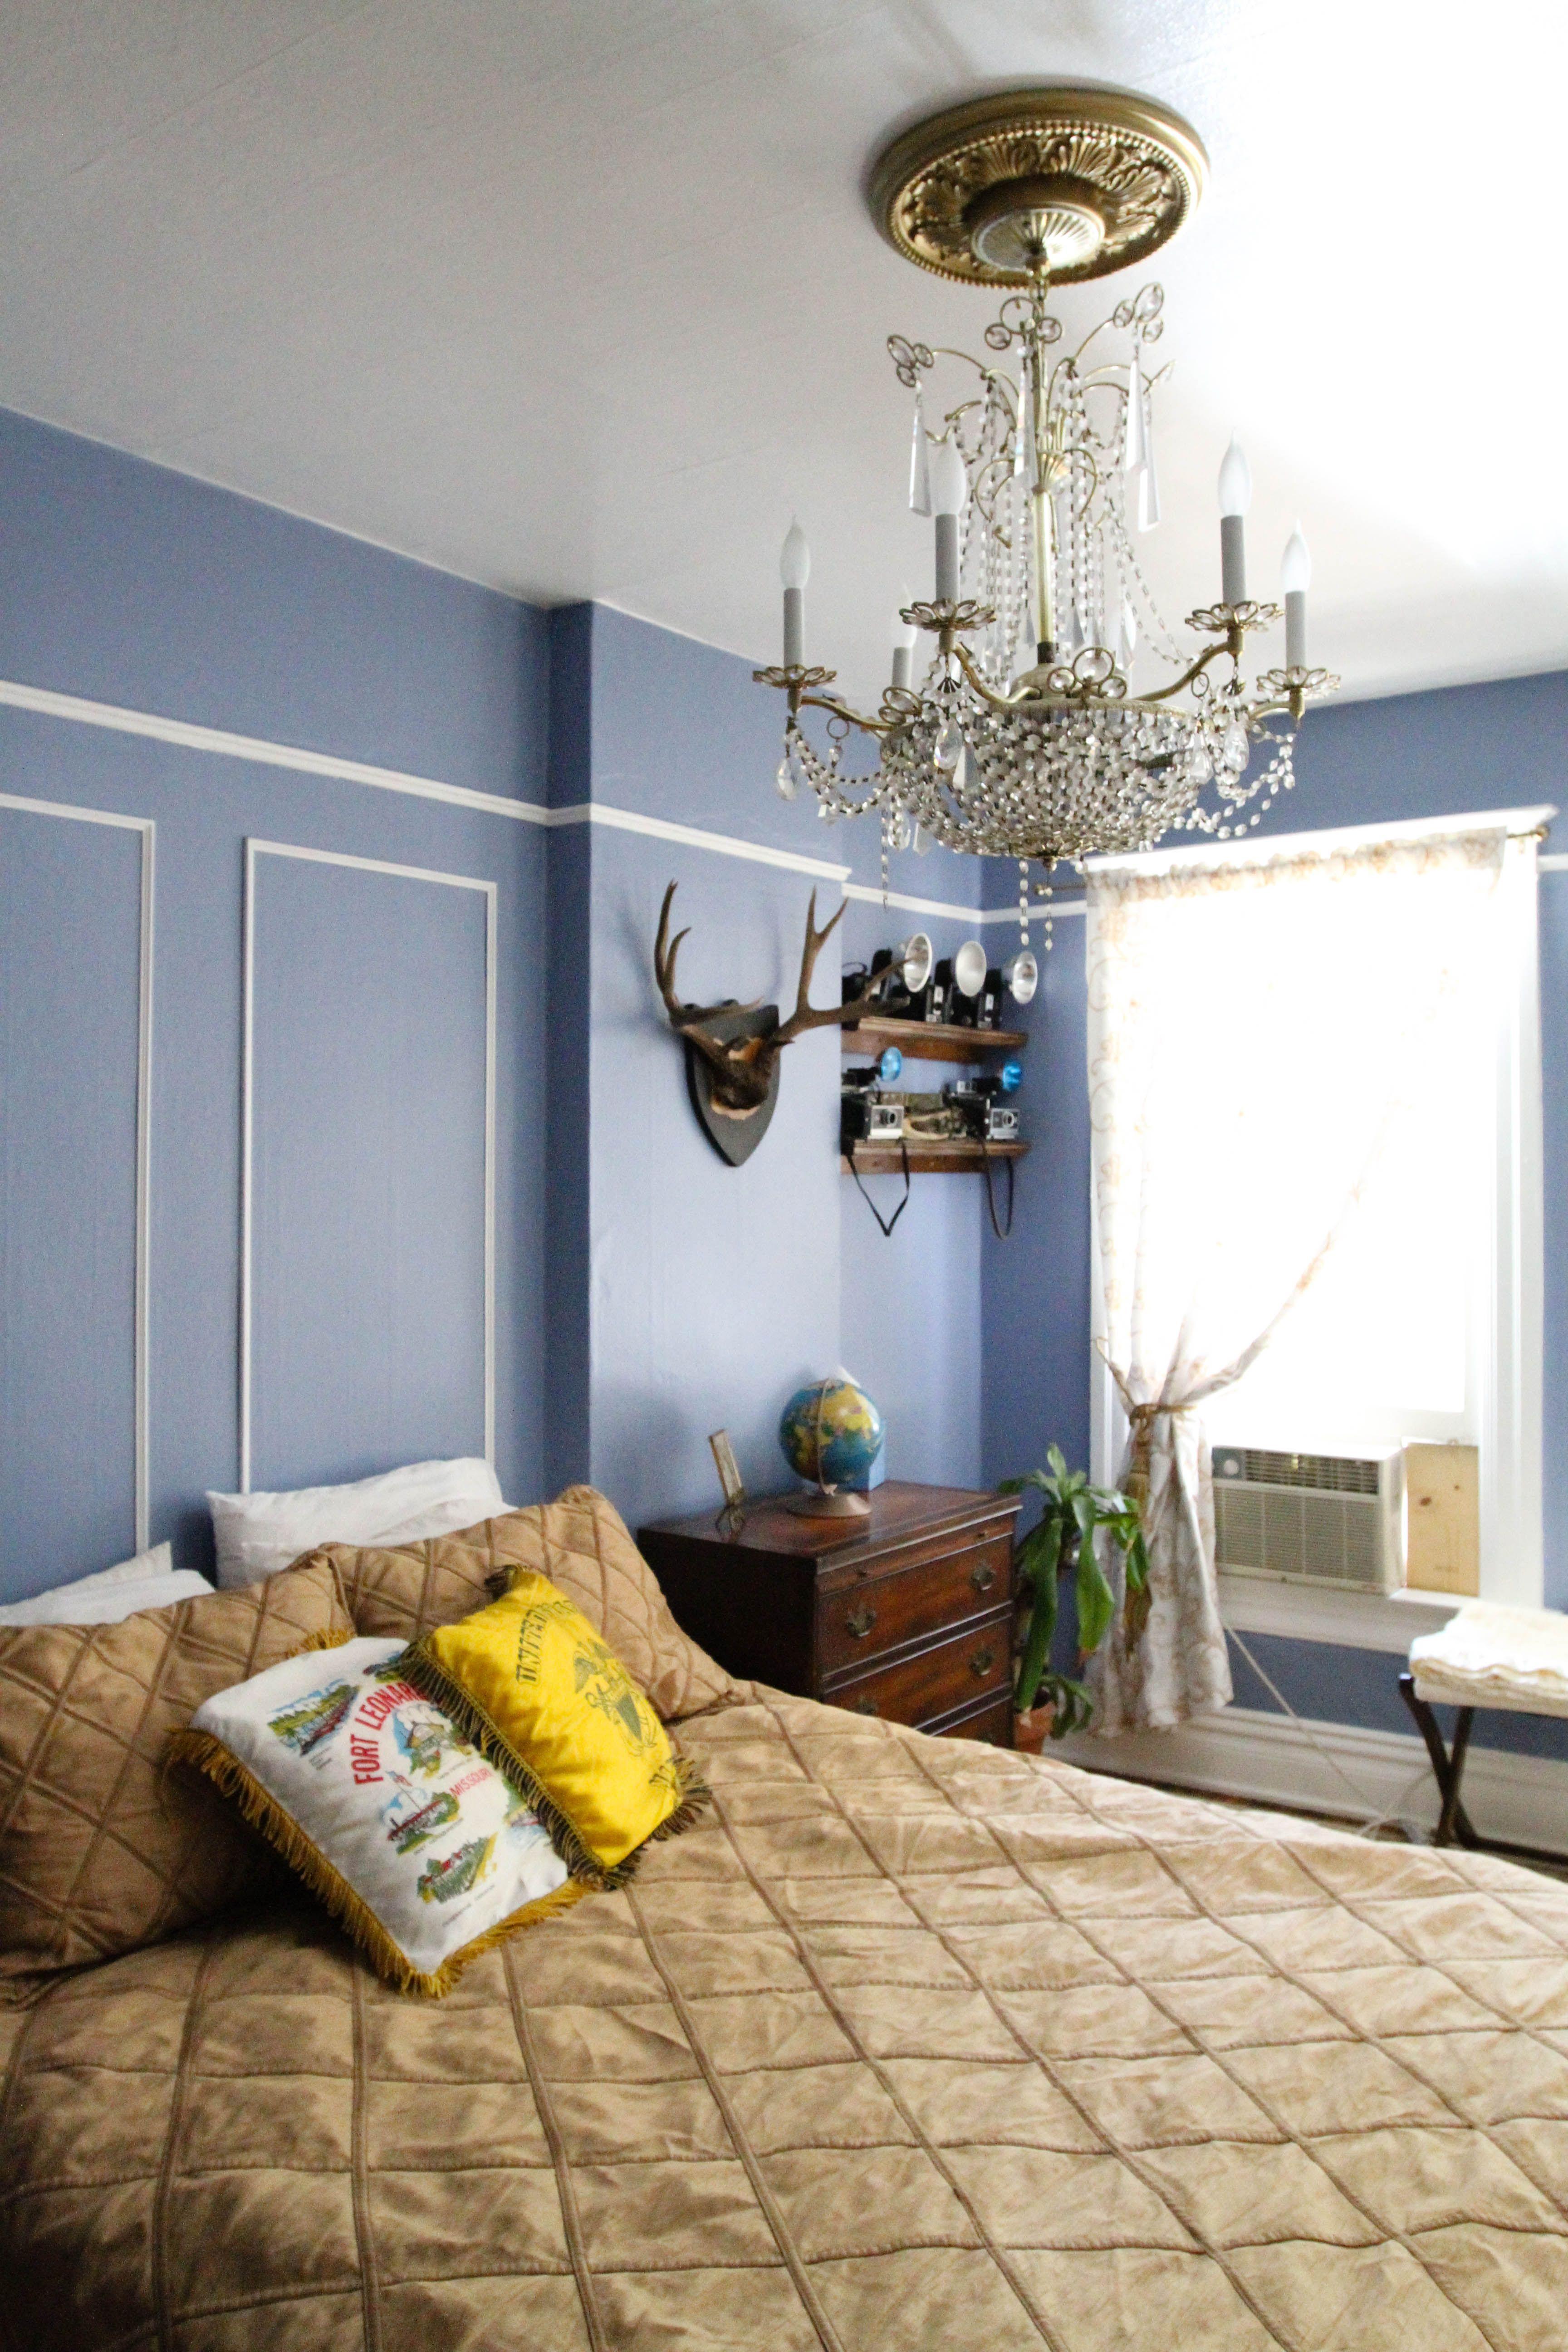 Joe's Victorian 'Owl House' Bedroom decor, Minimalist